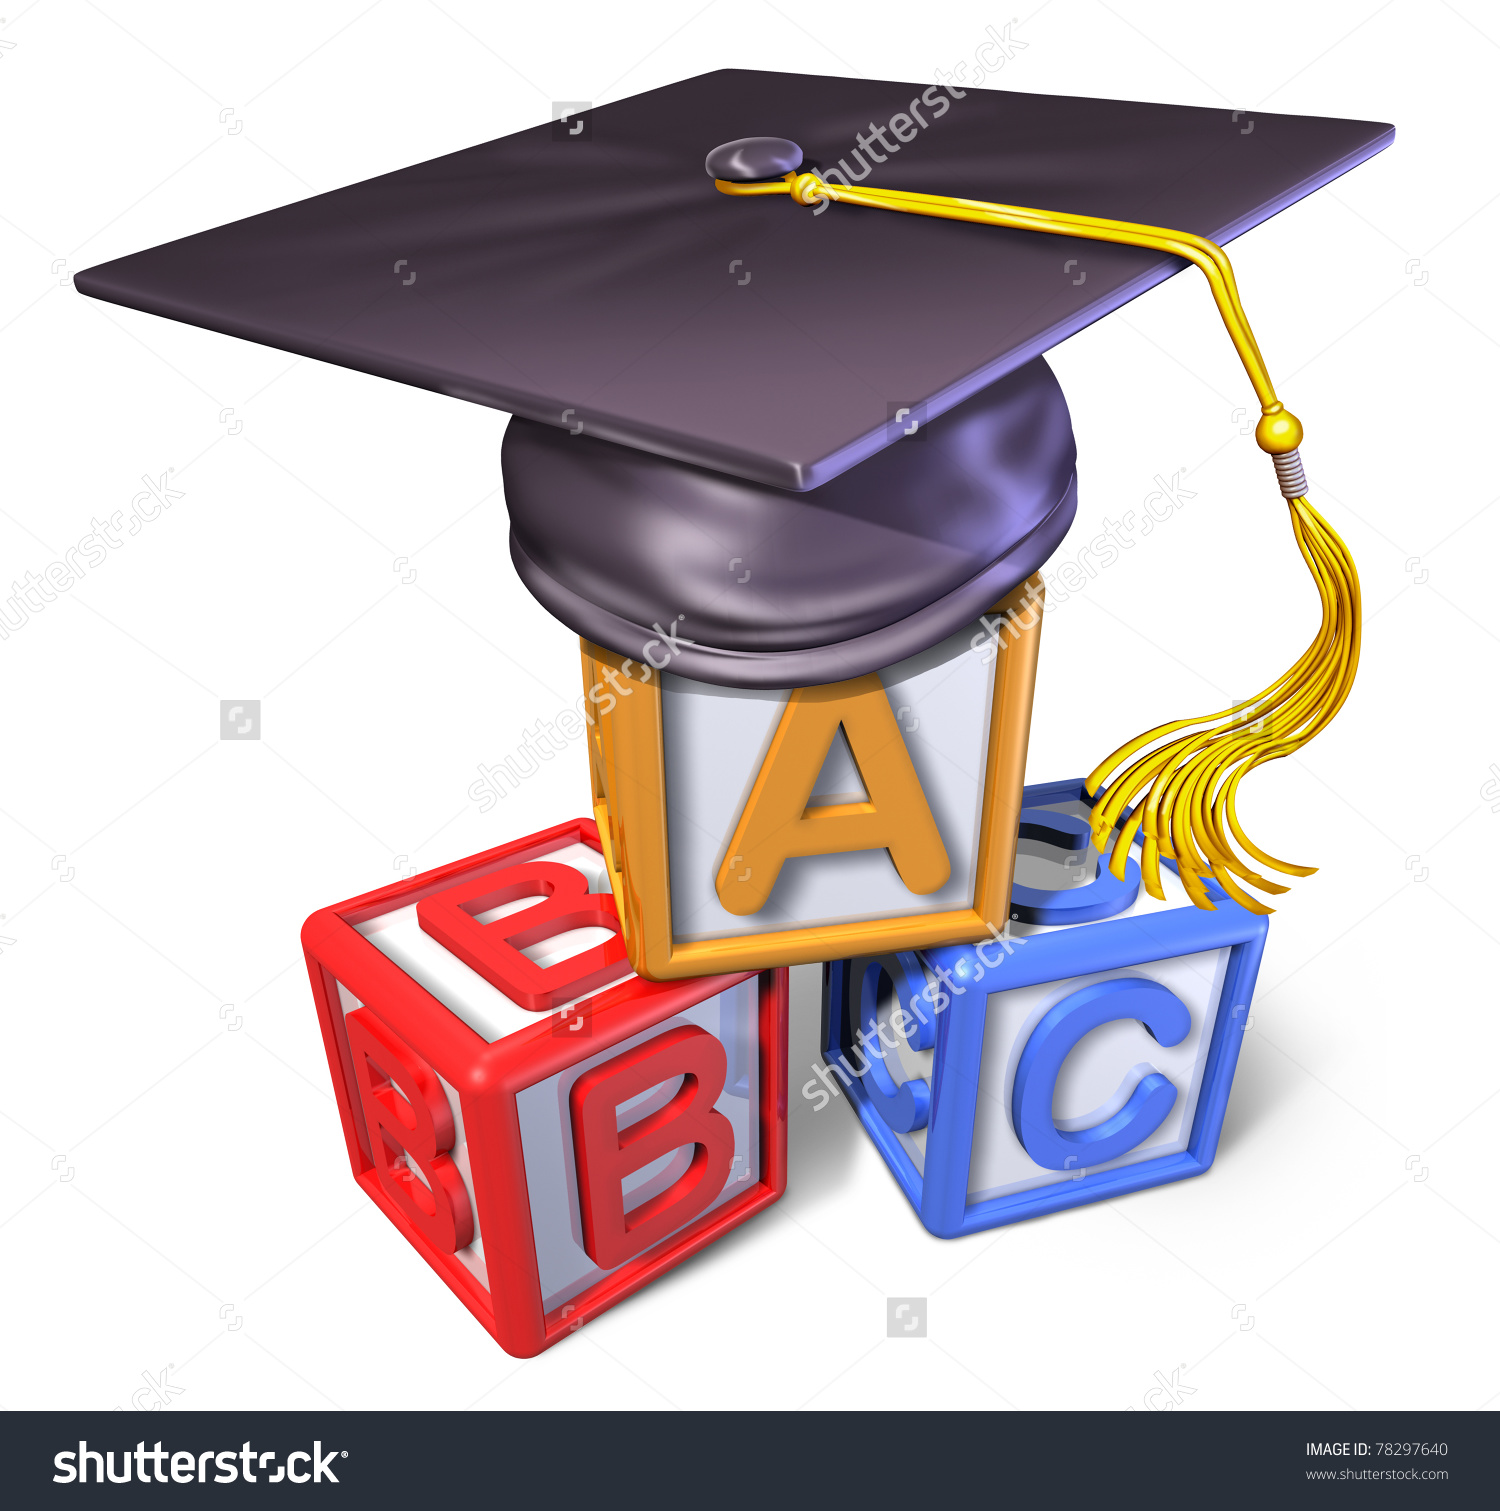 Graduation Cap Play Blocks Representing Concept Stock Illustration.